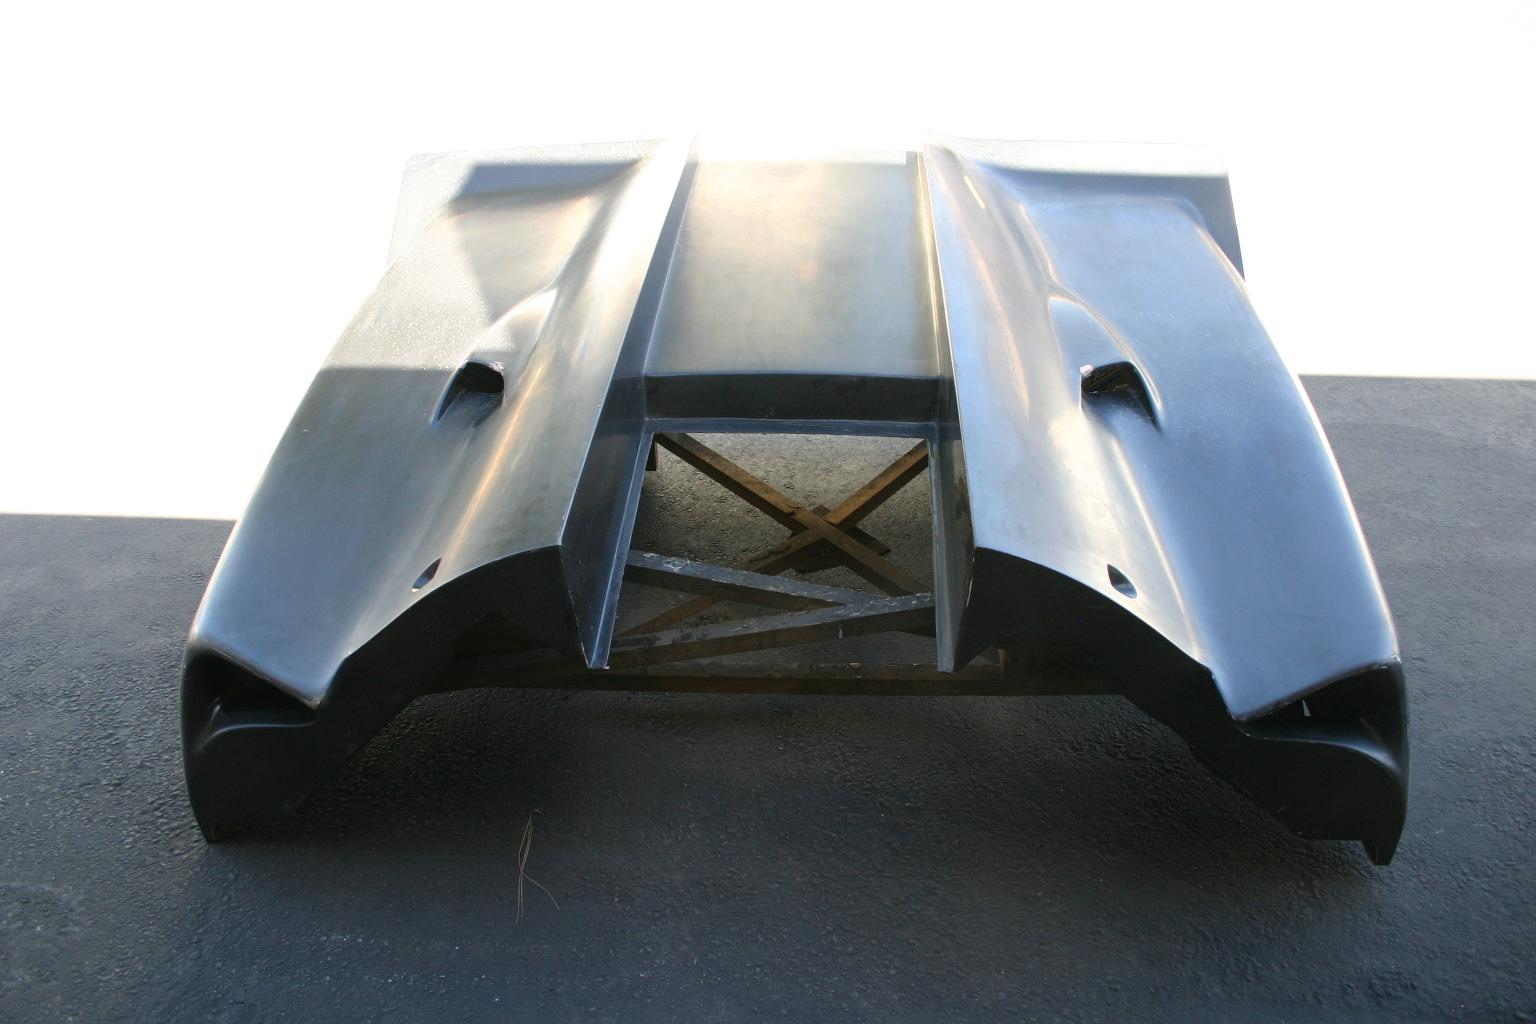 Lola T-70 MK3 B Tub & Bodywork coming in...-img_9479-jpg